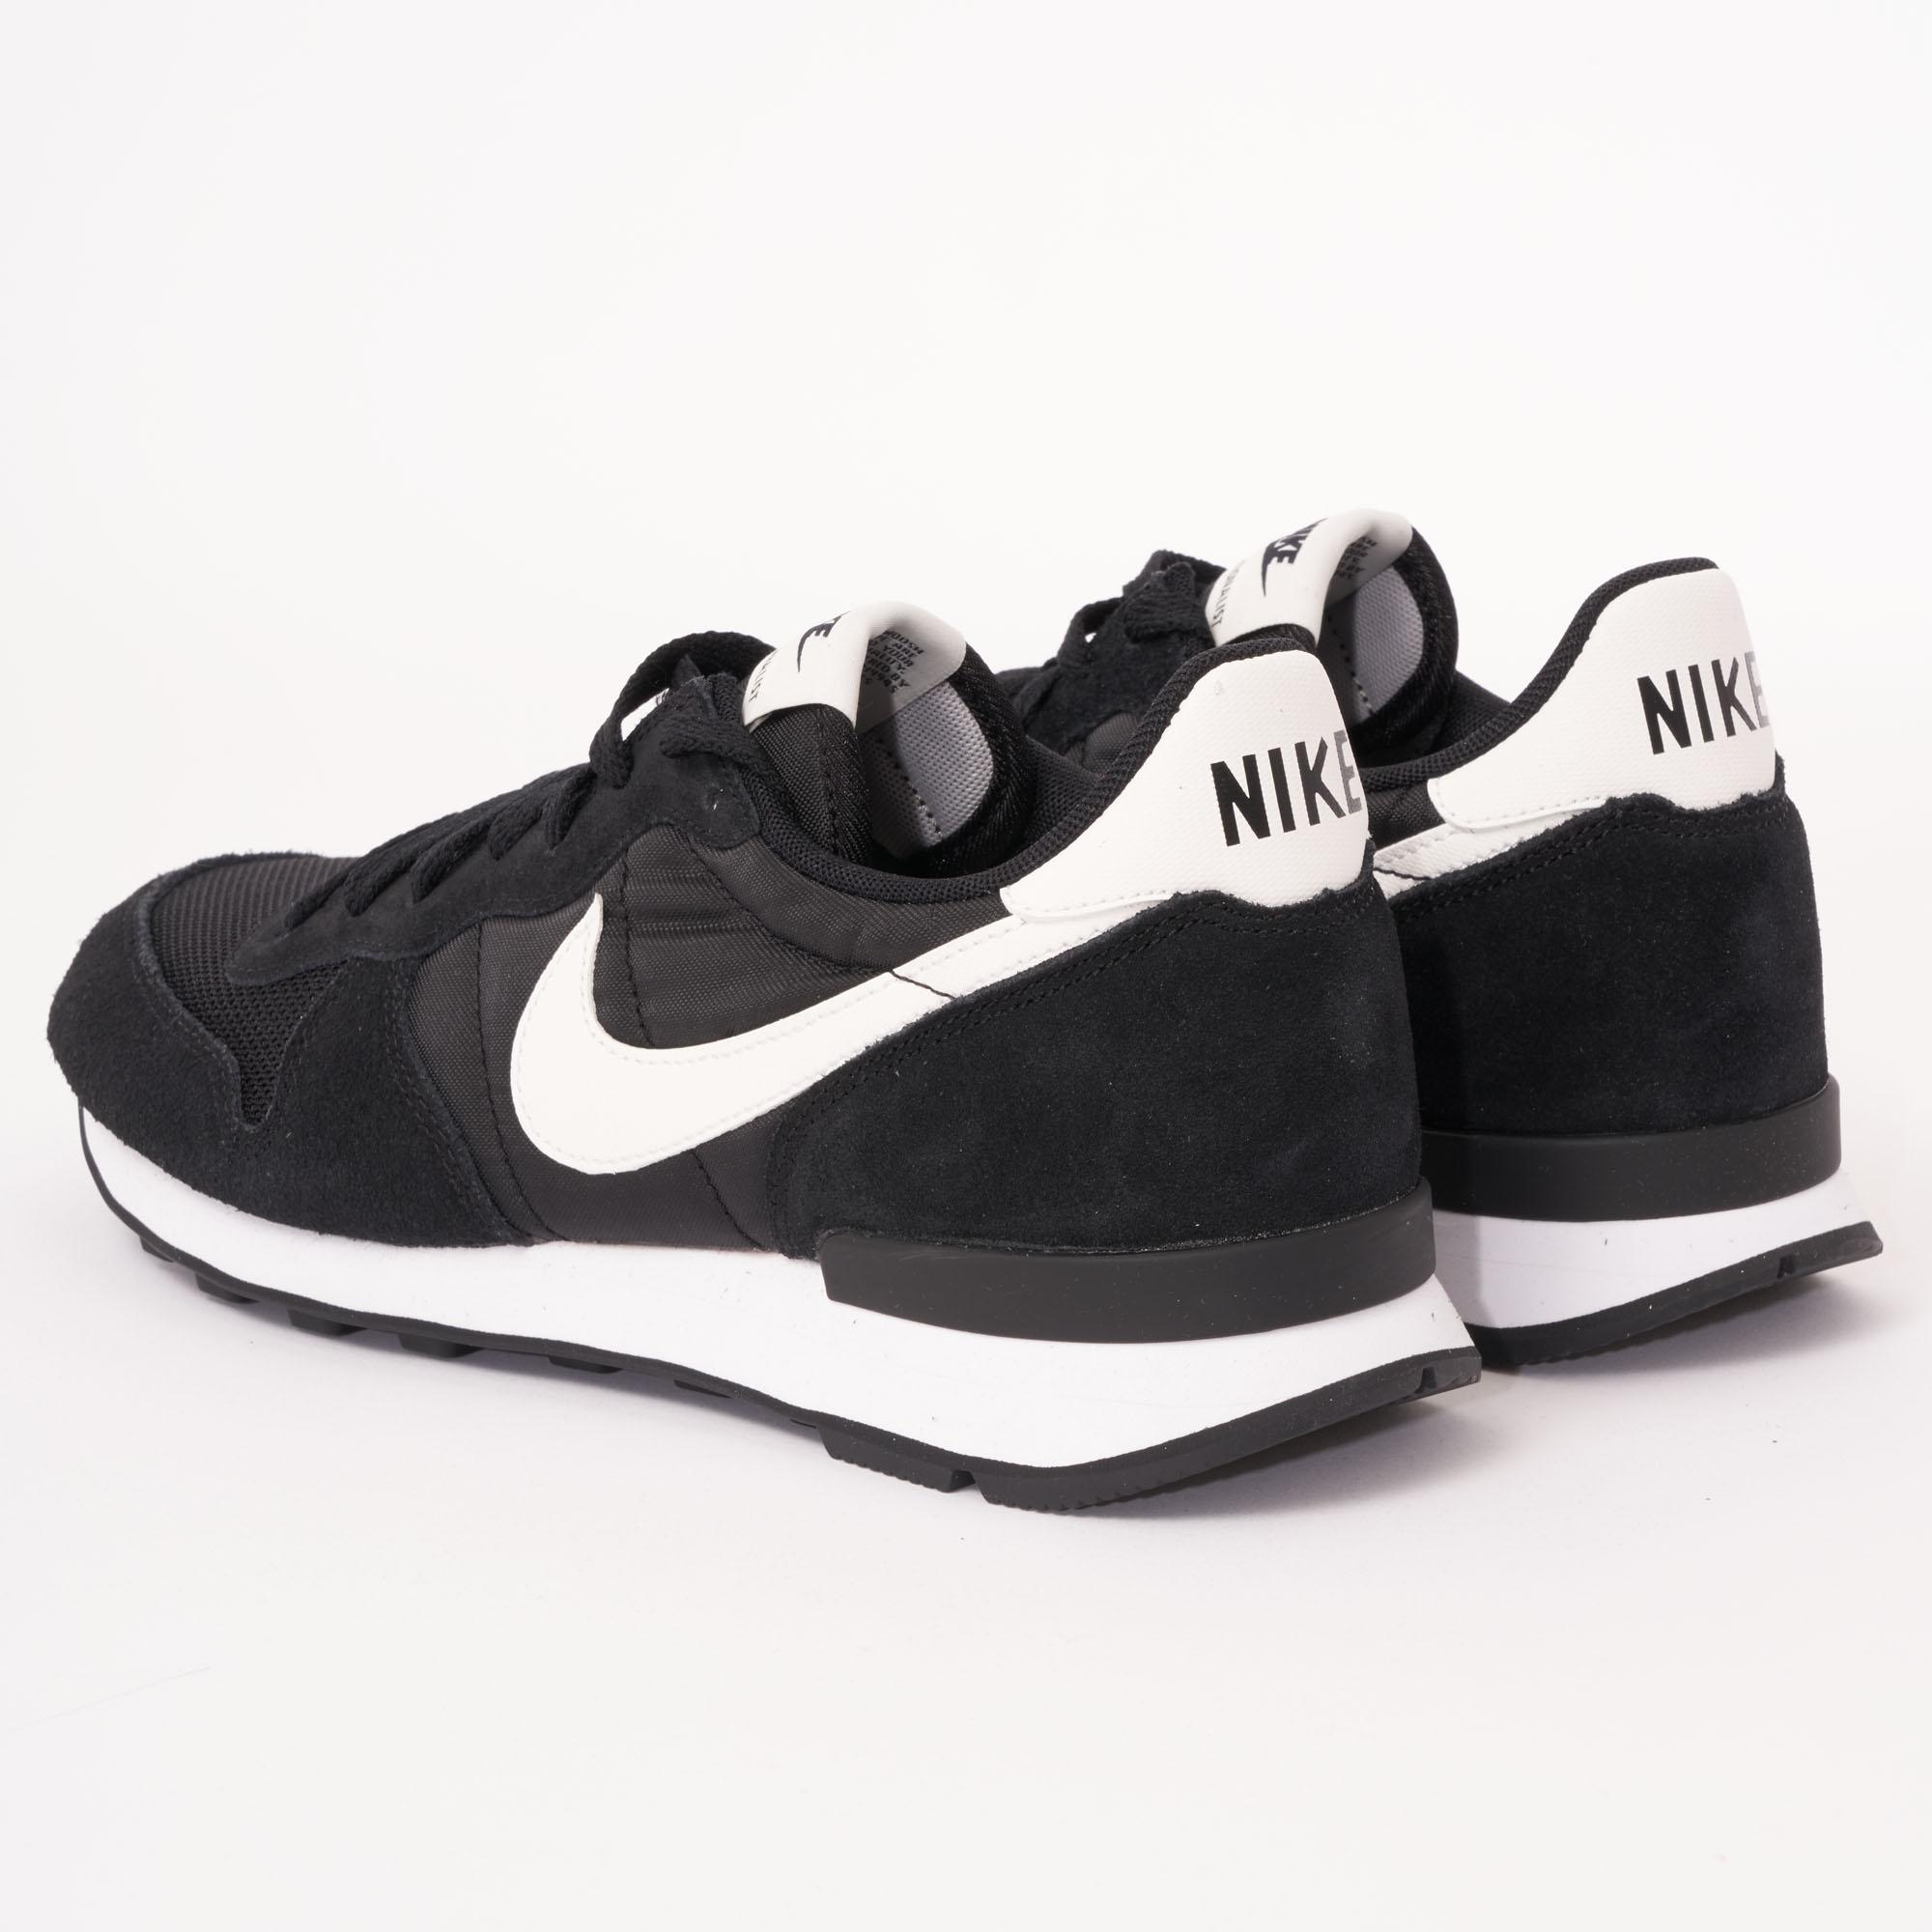 47558854c481 Lyst - Nike Internationalist in Black for Men - Save 14.705882352941174%